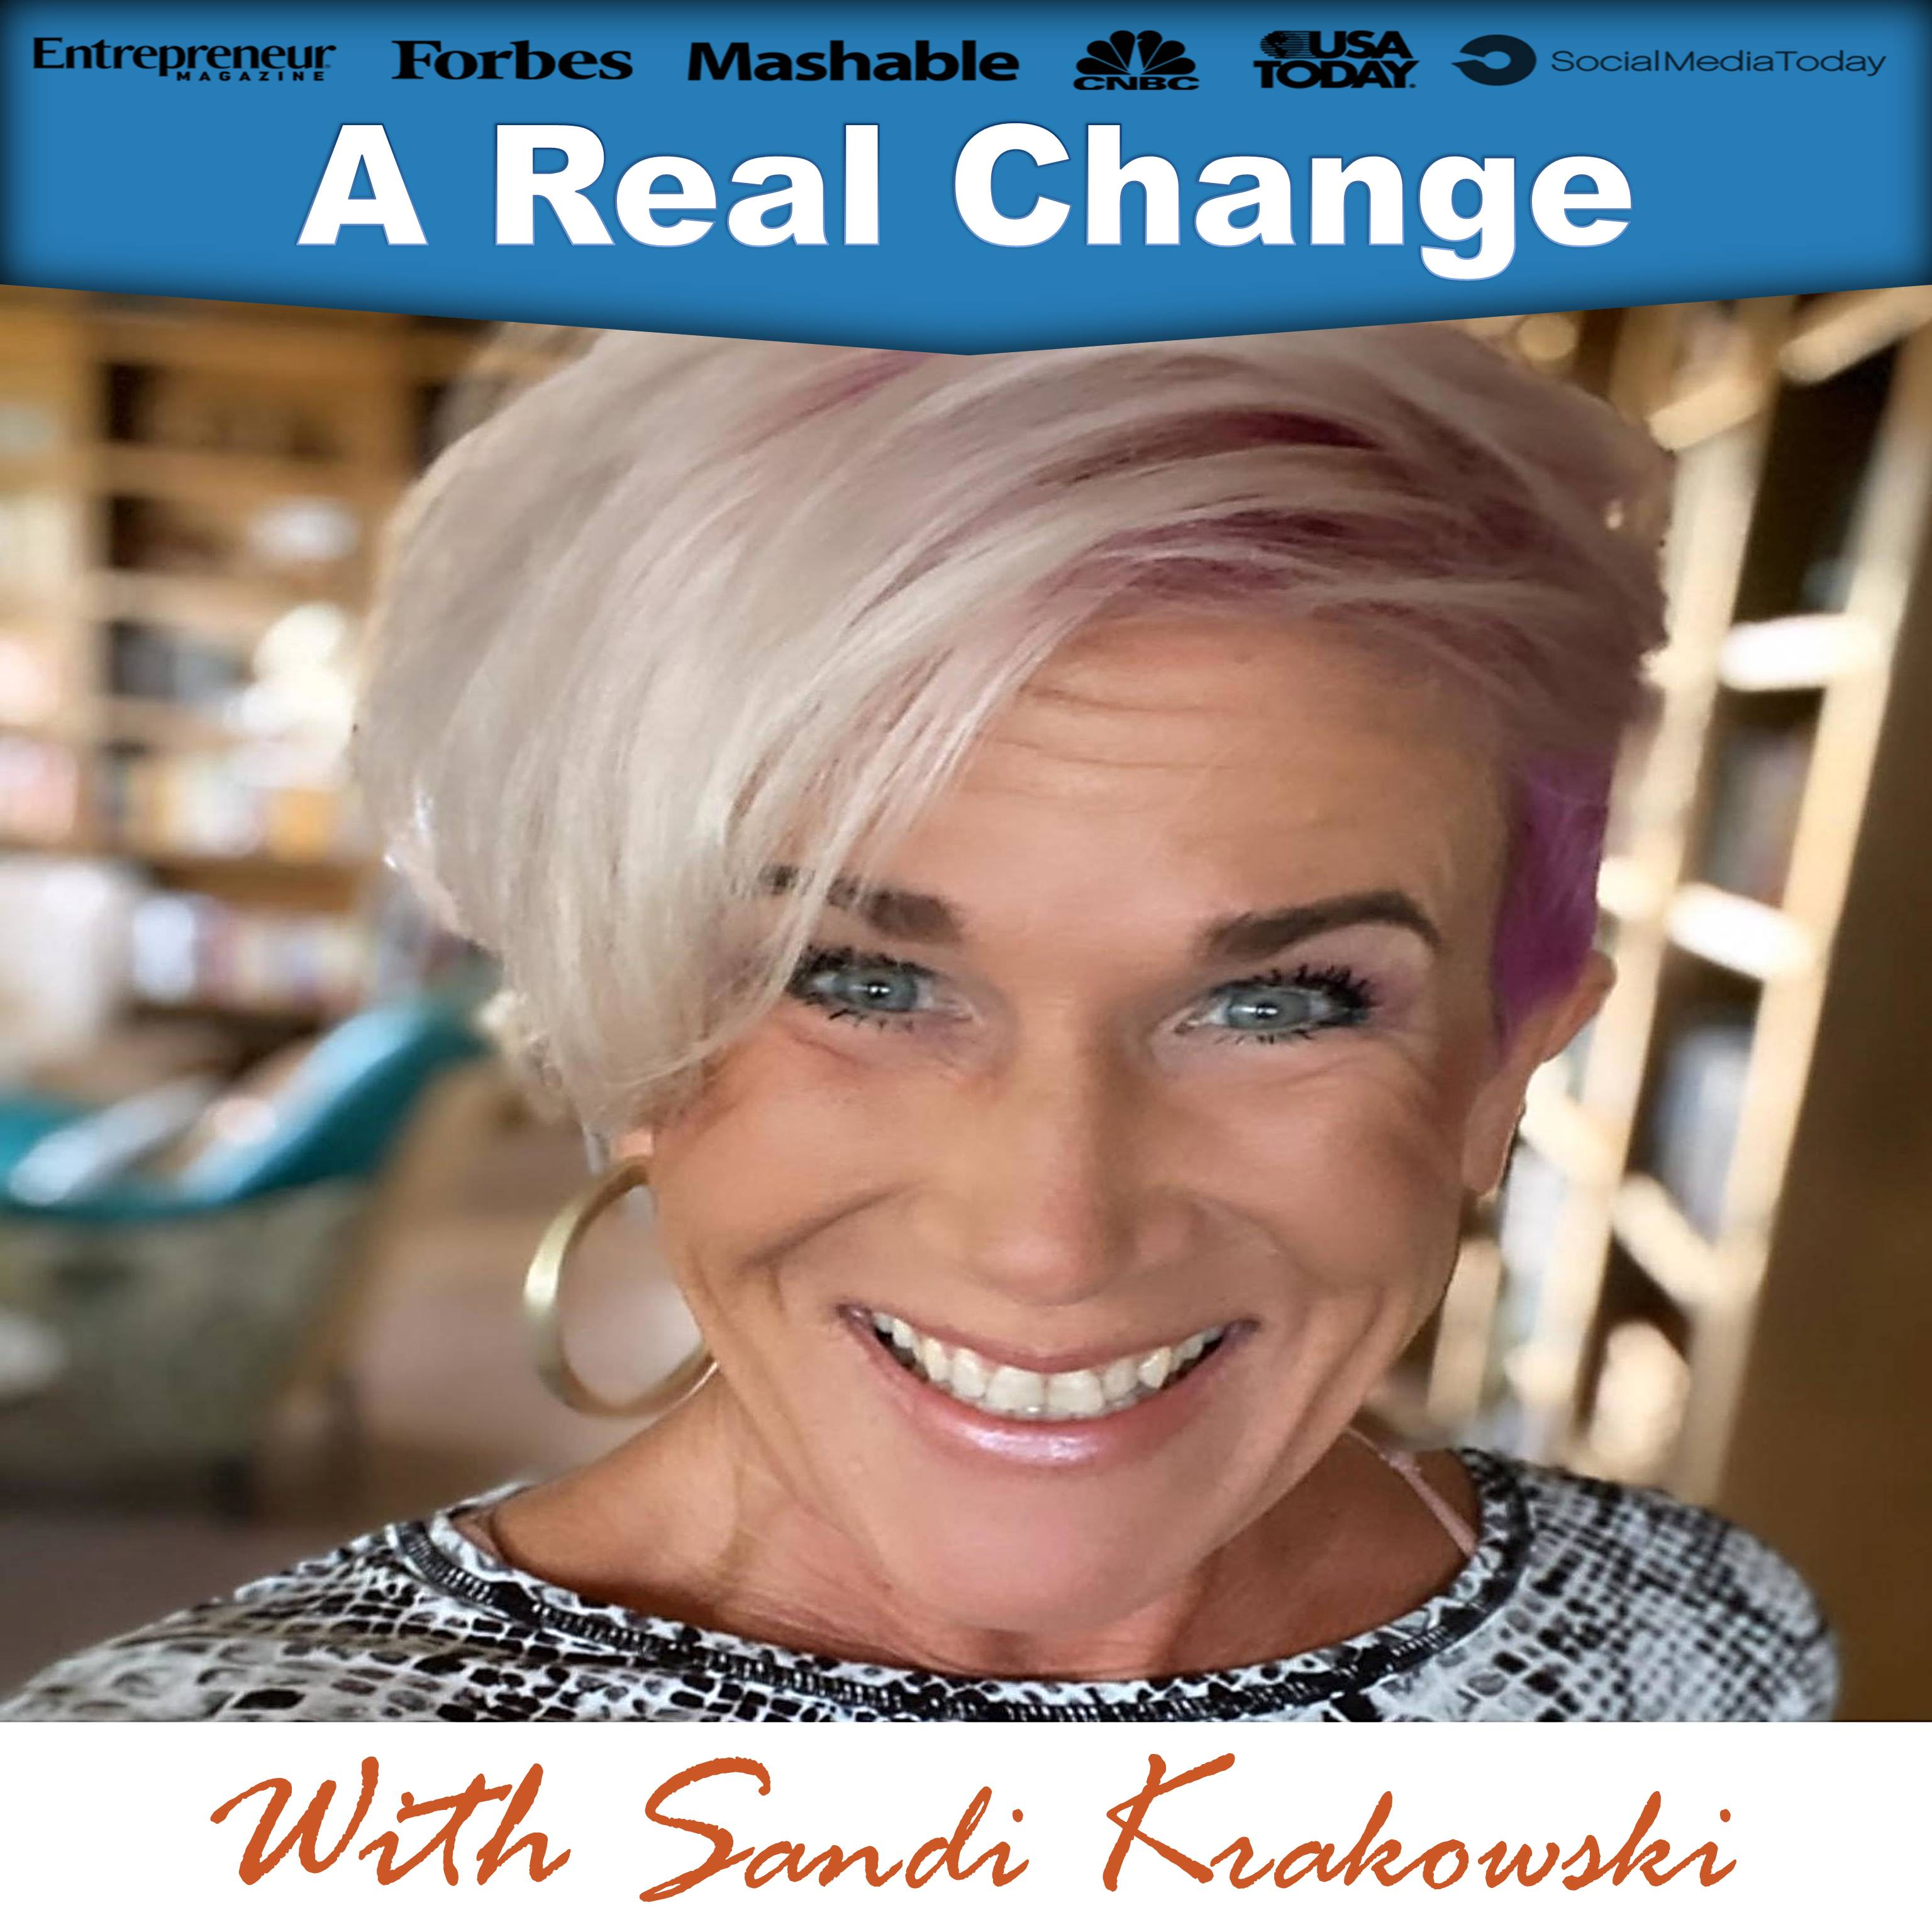 A Real Change With Sandi Krakowski show image